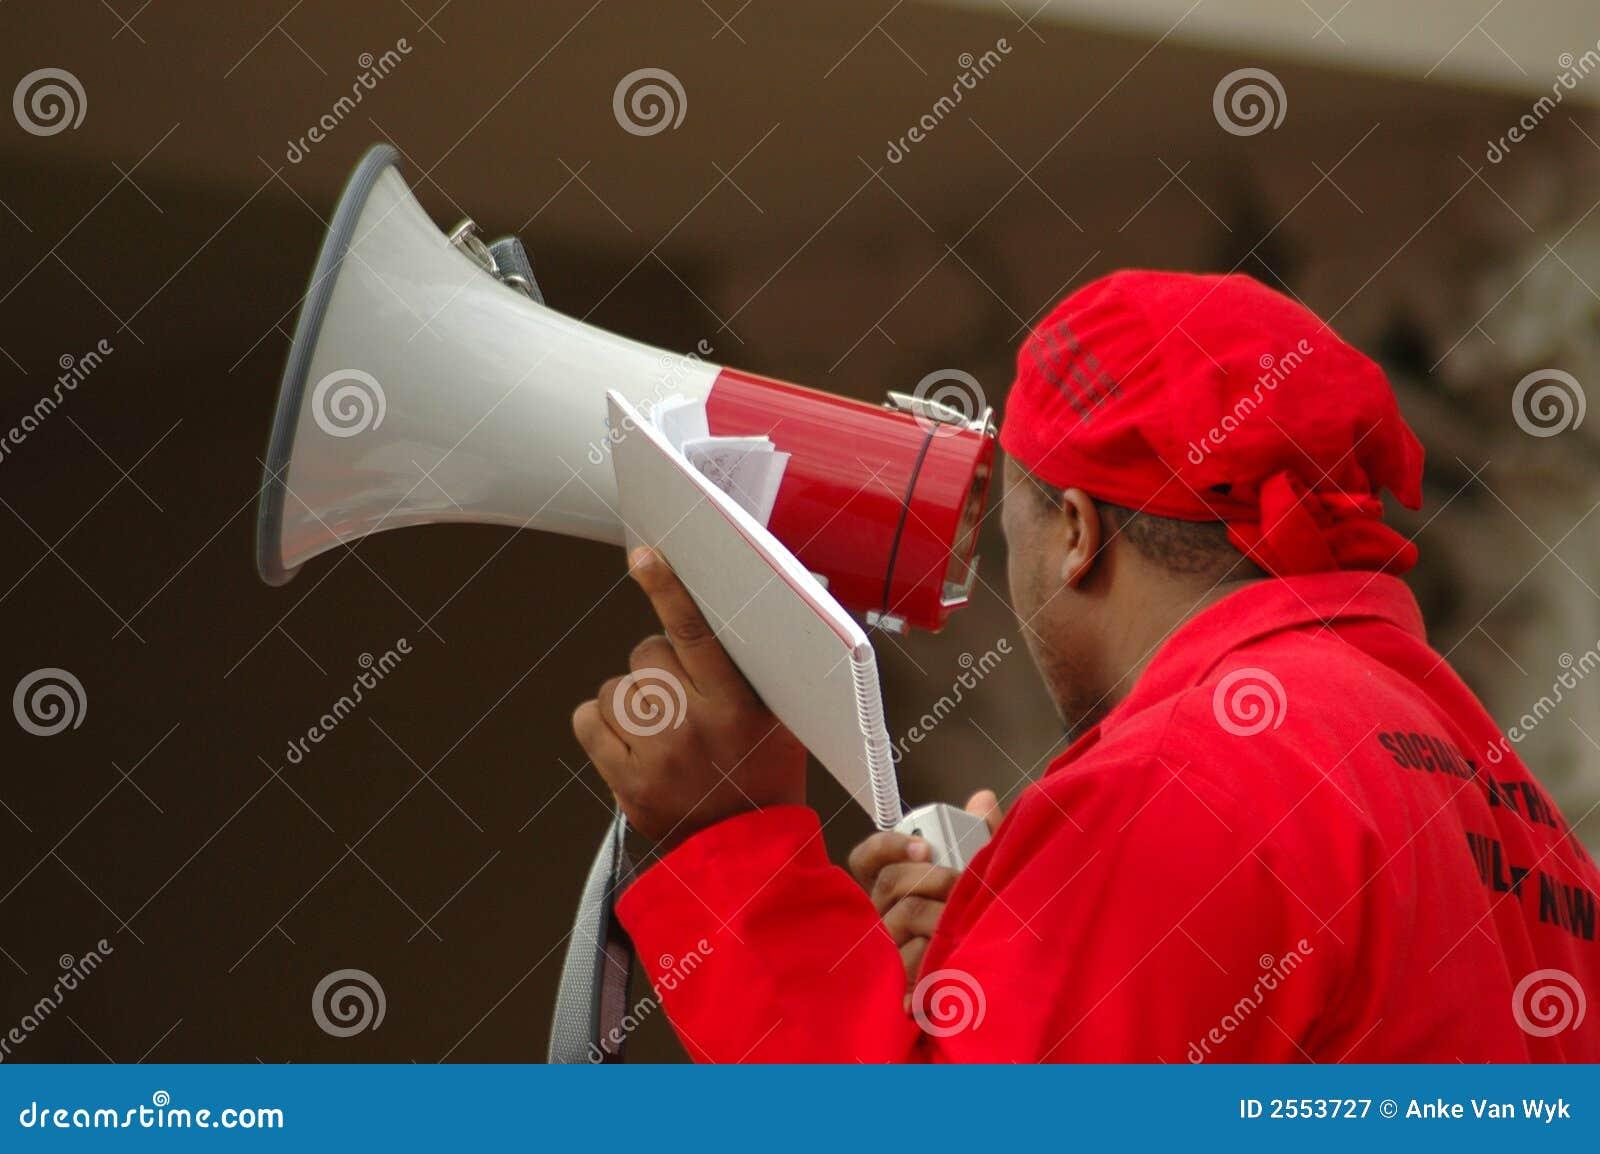 Megaphone Man Editorial Photography - Image: 2553727